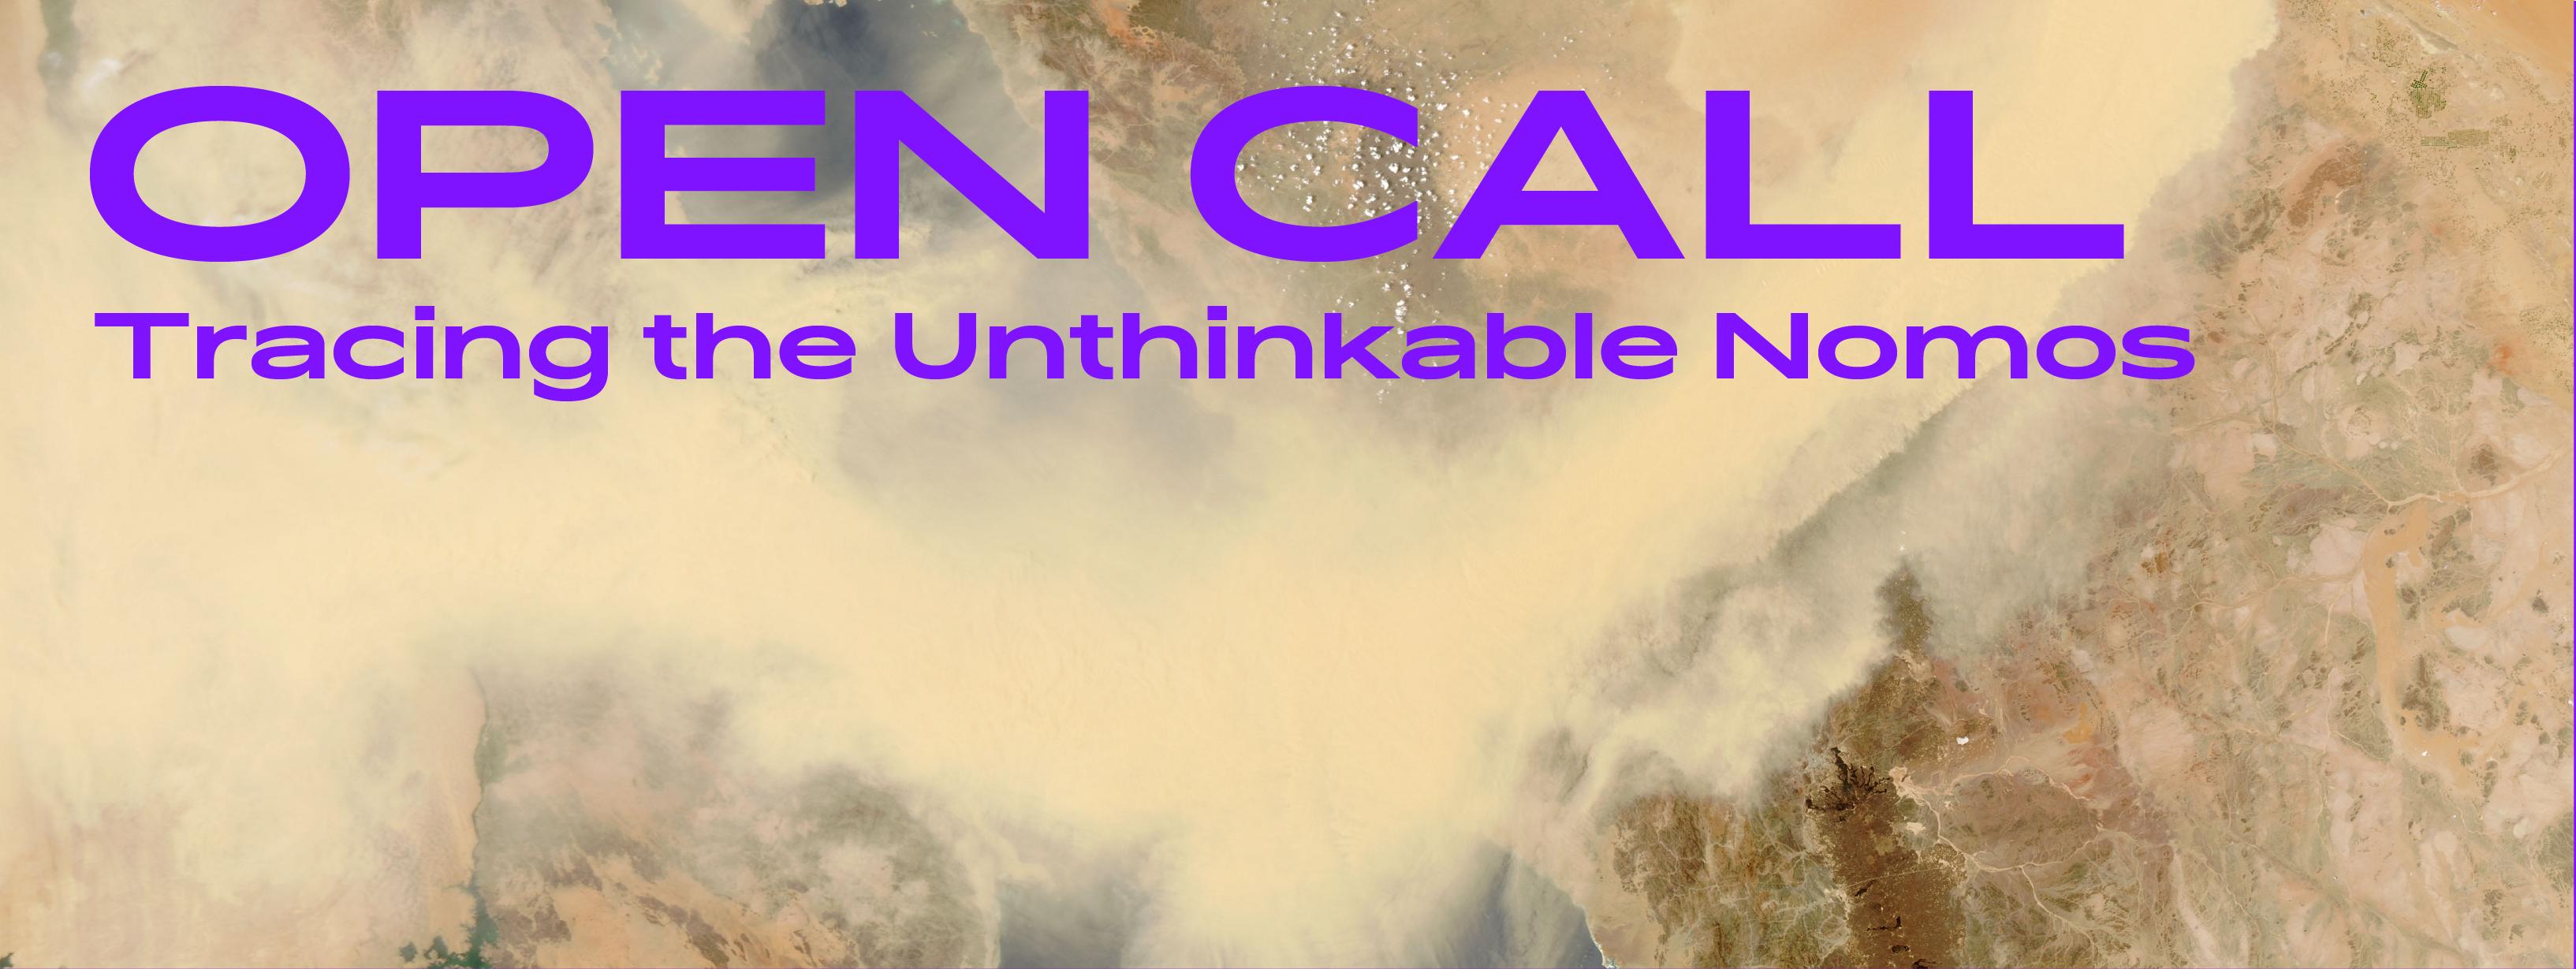 Unthinkable Nomos